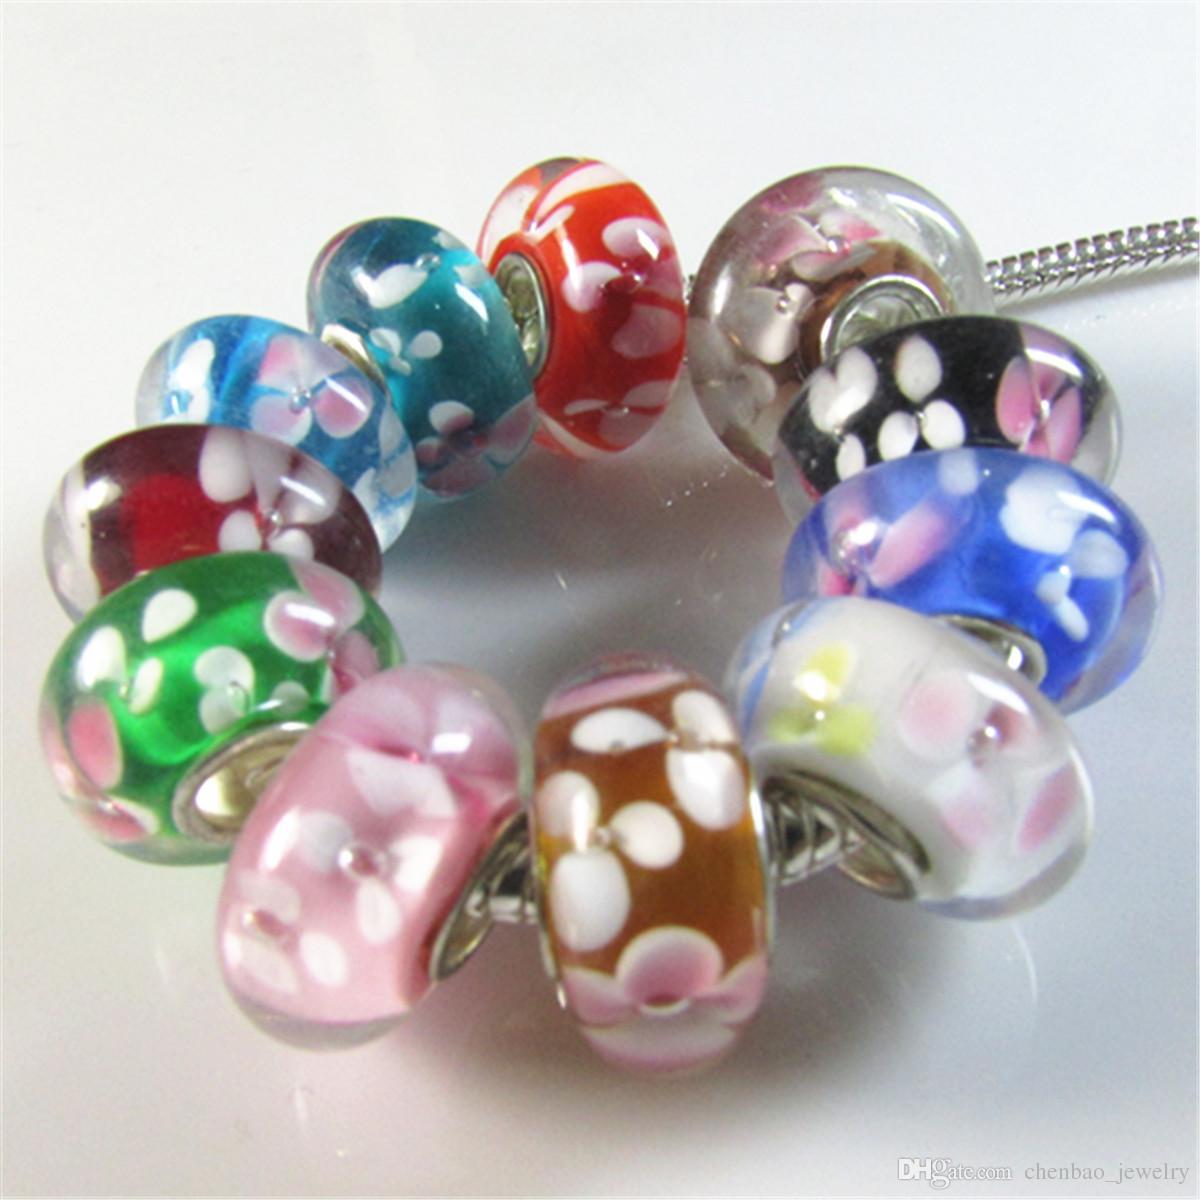 dd7e81635f237 30pcs/lot Murano Glass Charm Beautiful Flower Big Hole Charm Beads Fit  European Bracelet Slide Spacer Glass Bead